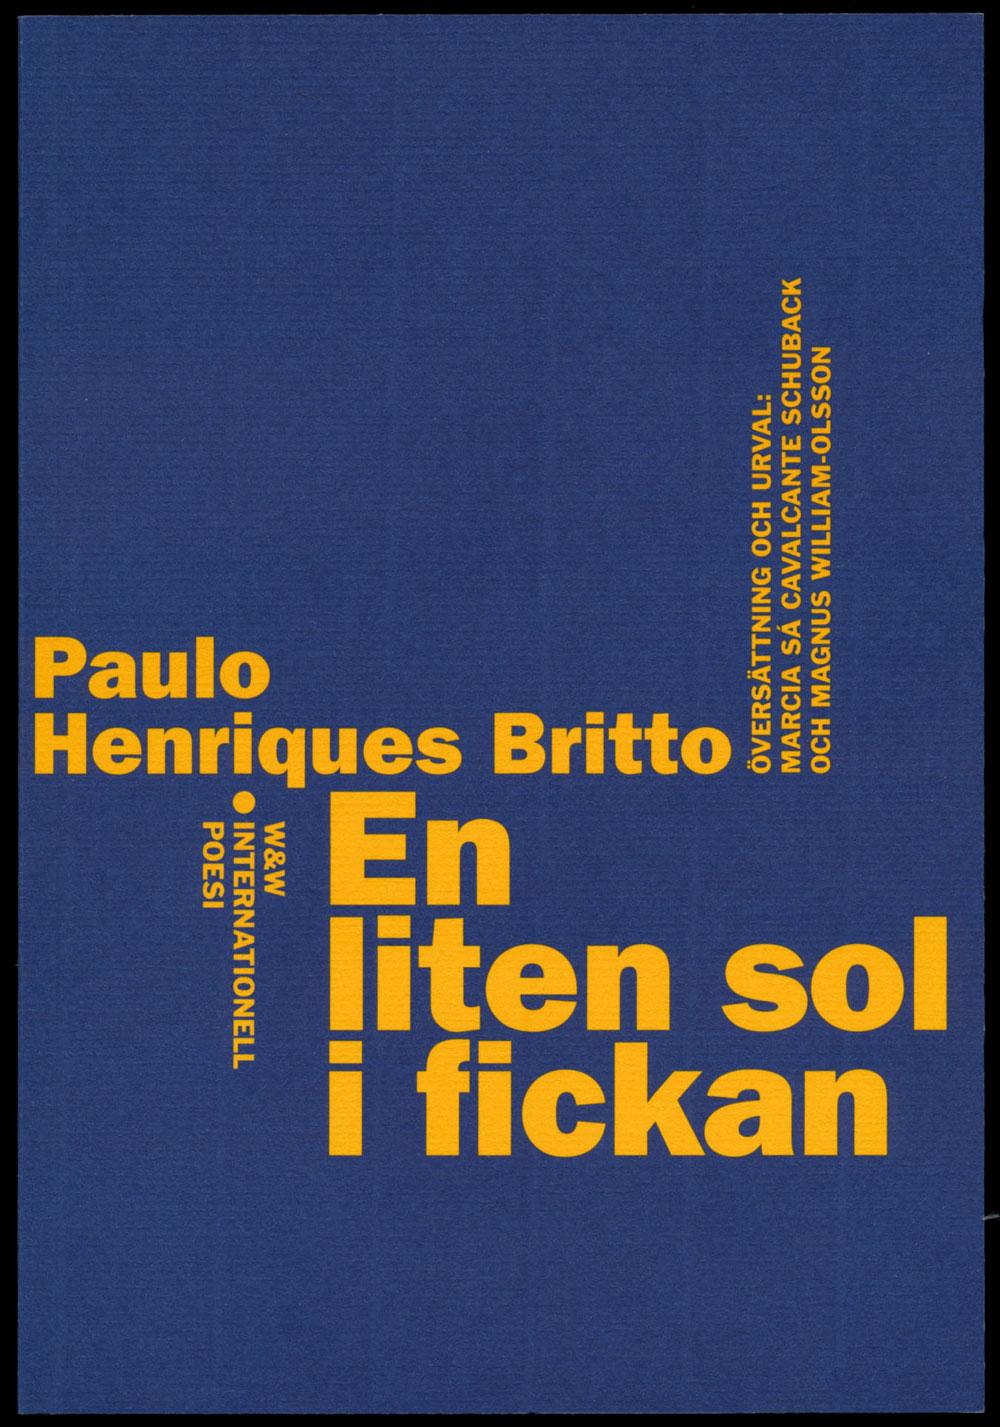 Paulo Henriques Britto En liten sol i fickan Wahlström & Widstrands serie med internationell poesi